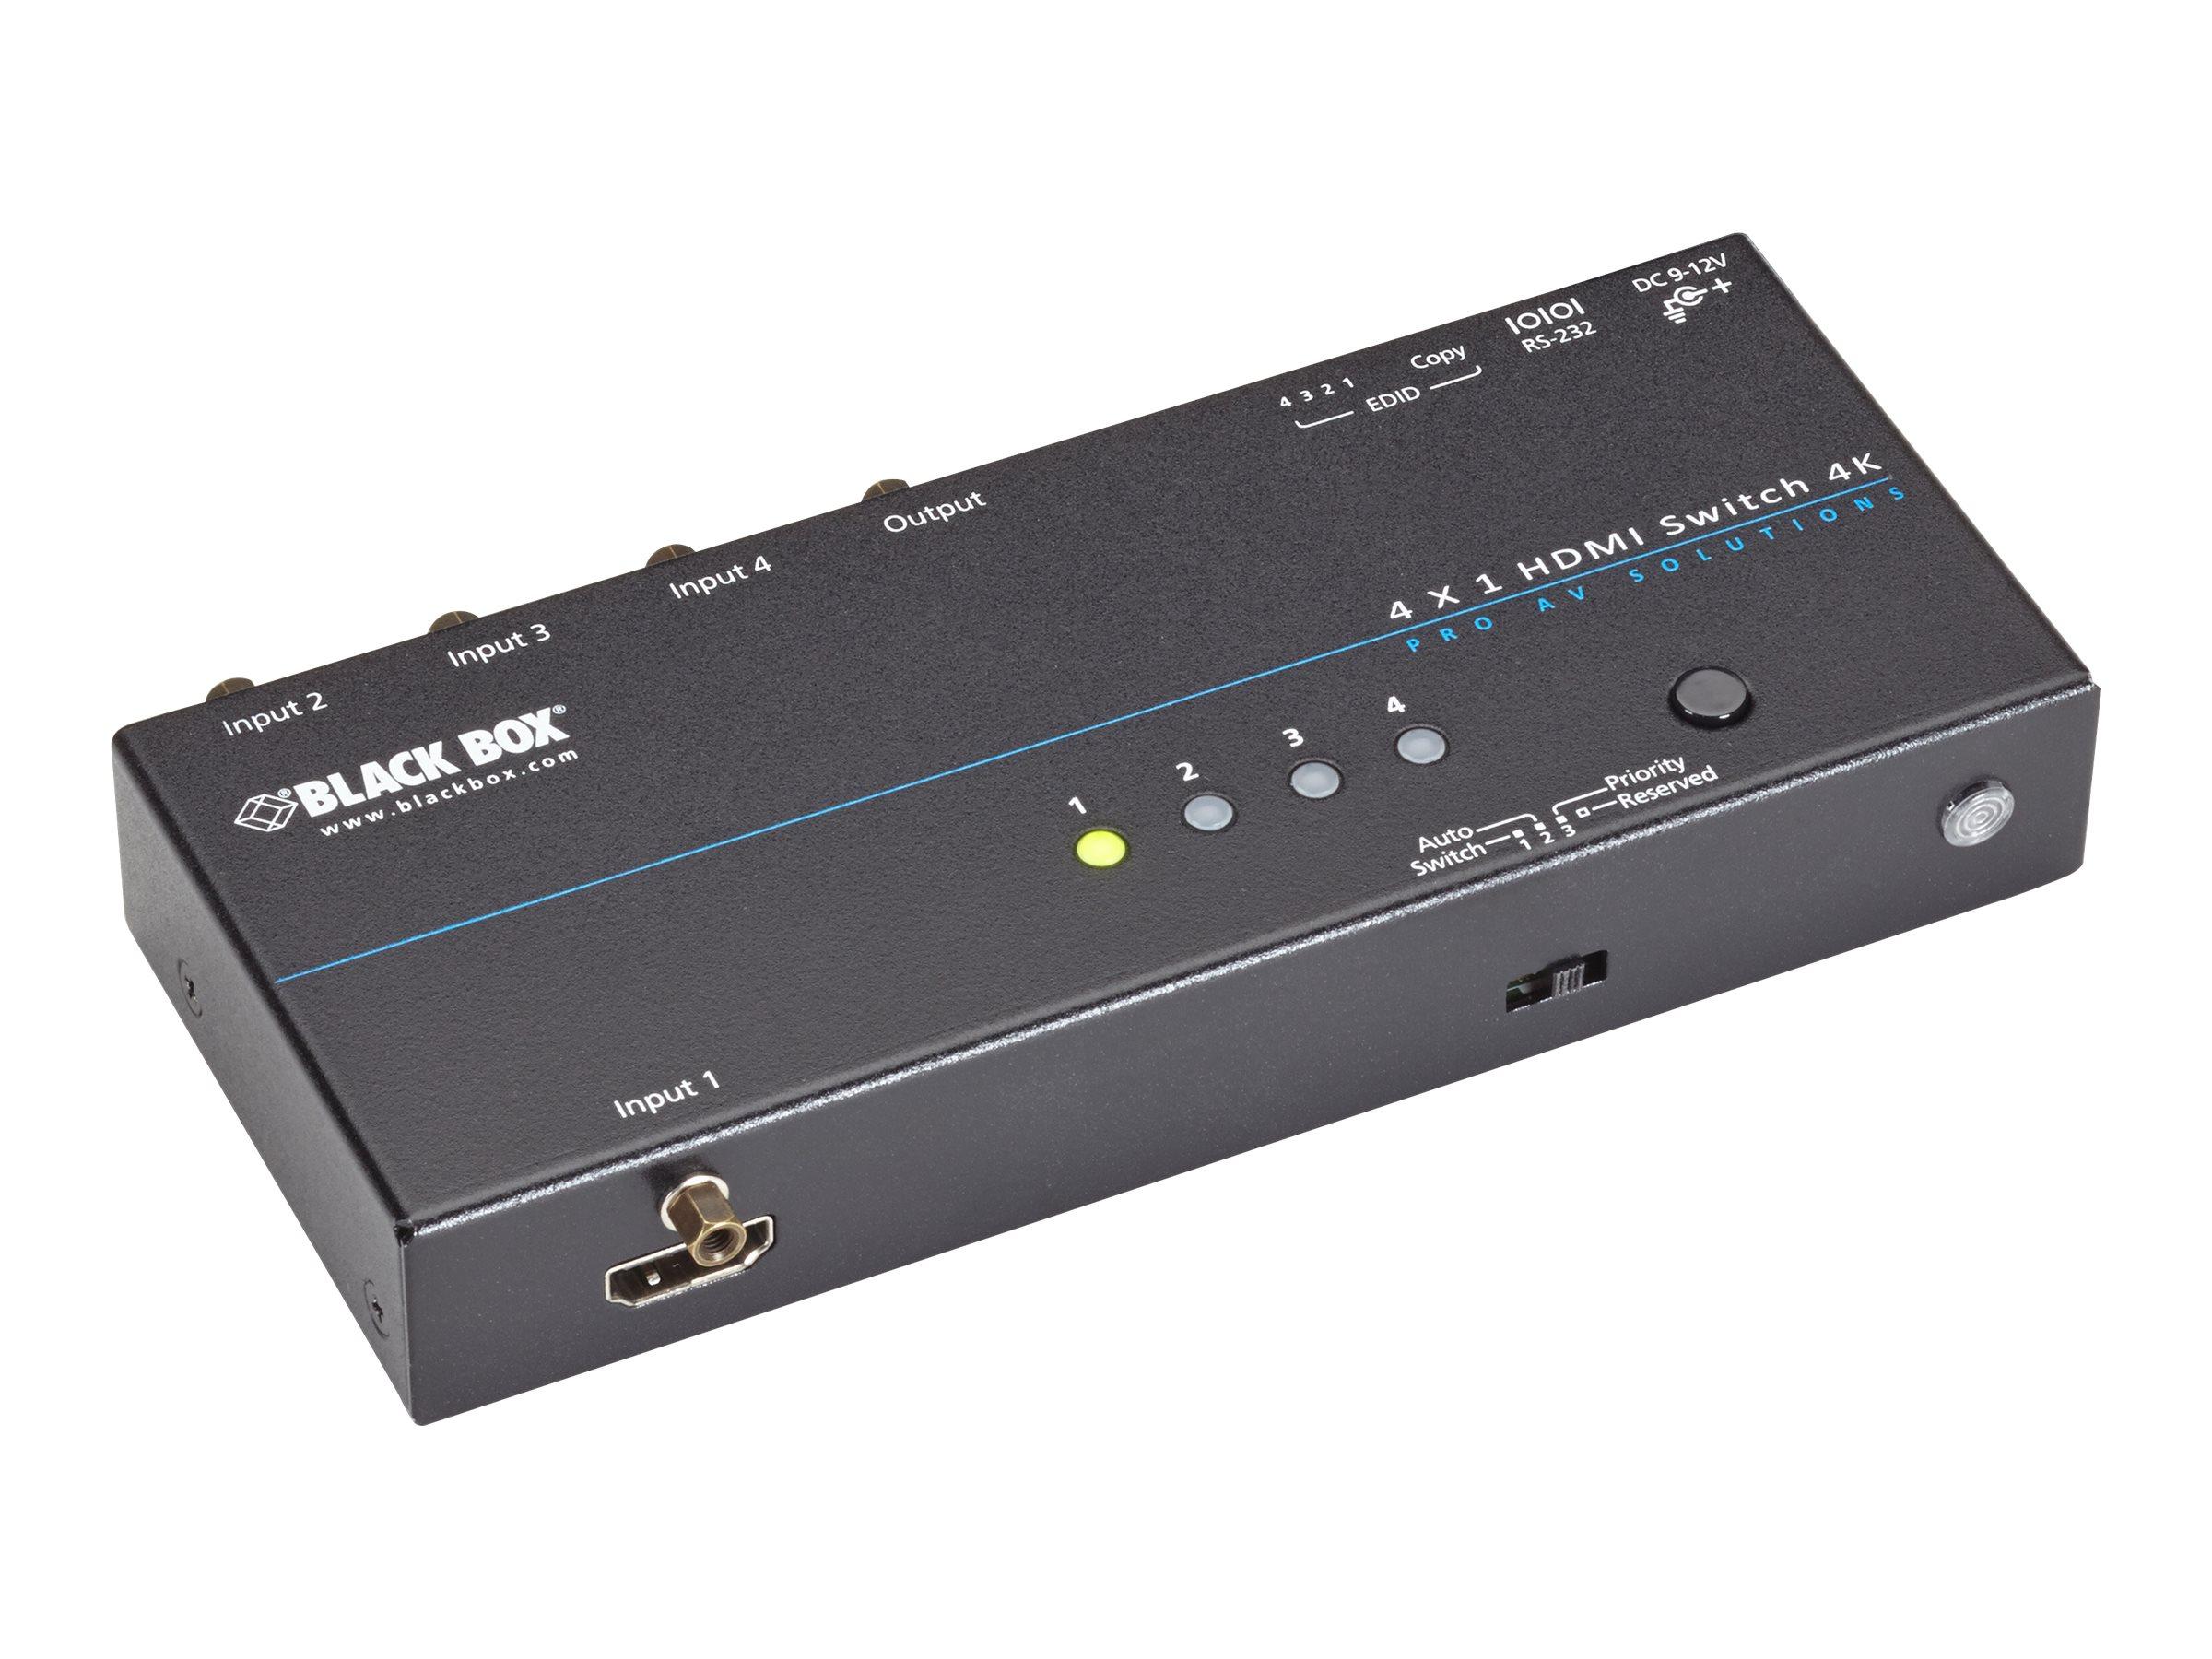 Black Box 4K HDMI Switch 2 x 1 - Video-Schalter - 2 x HDMI - Desktop - TAA-konform